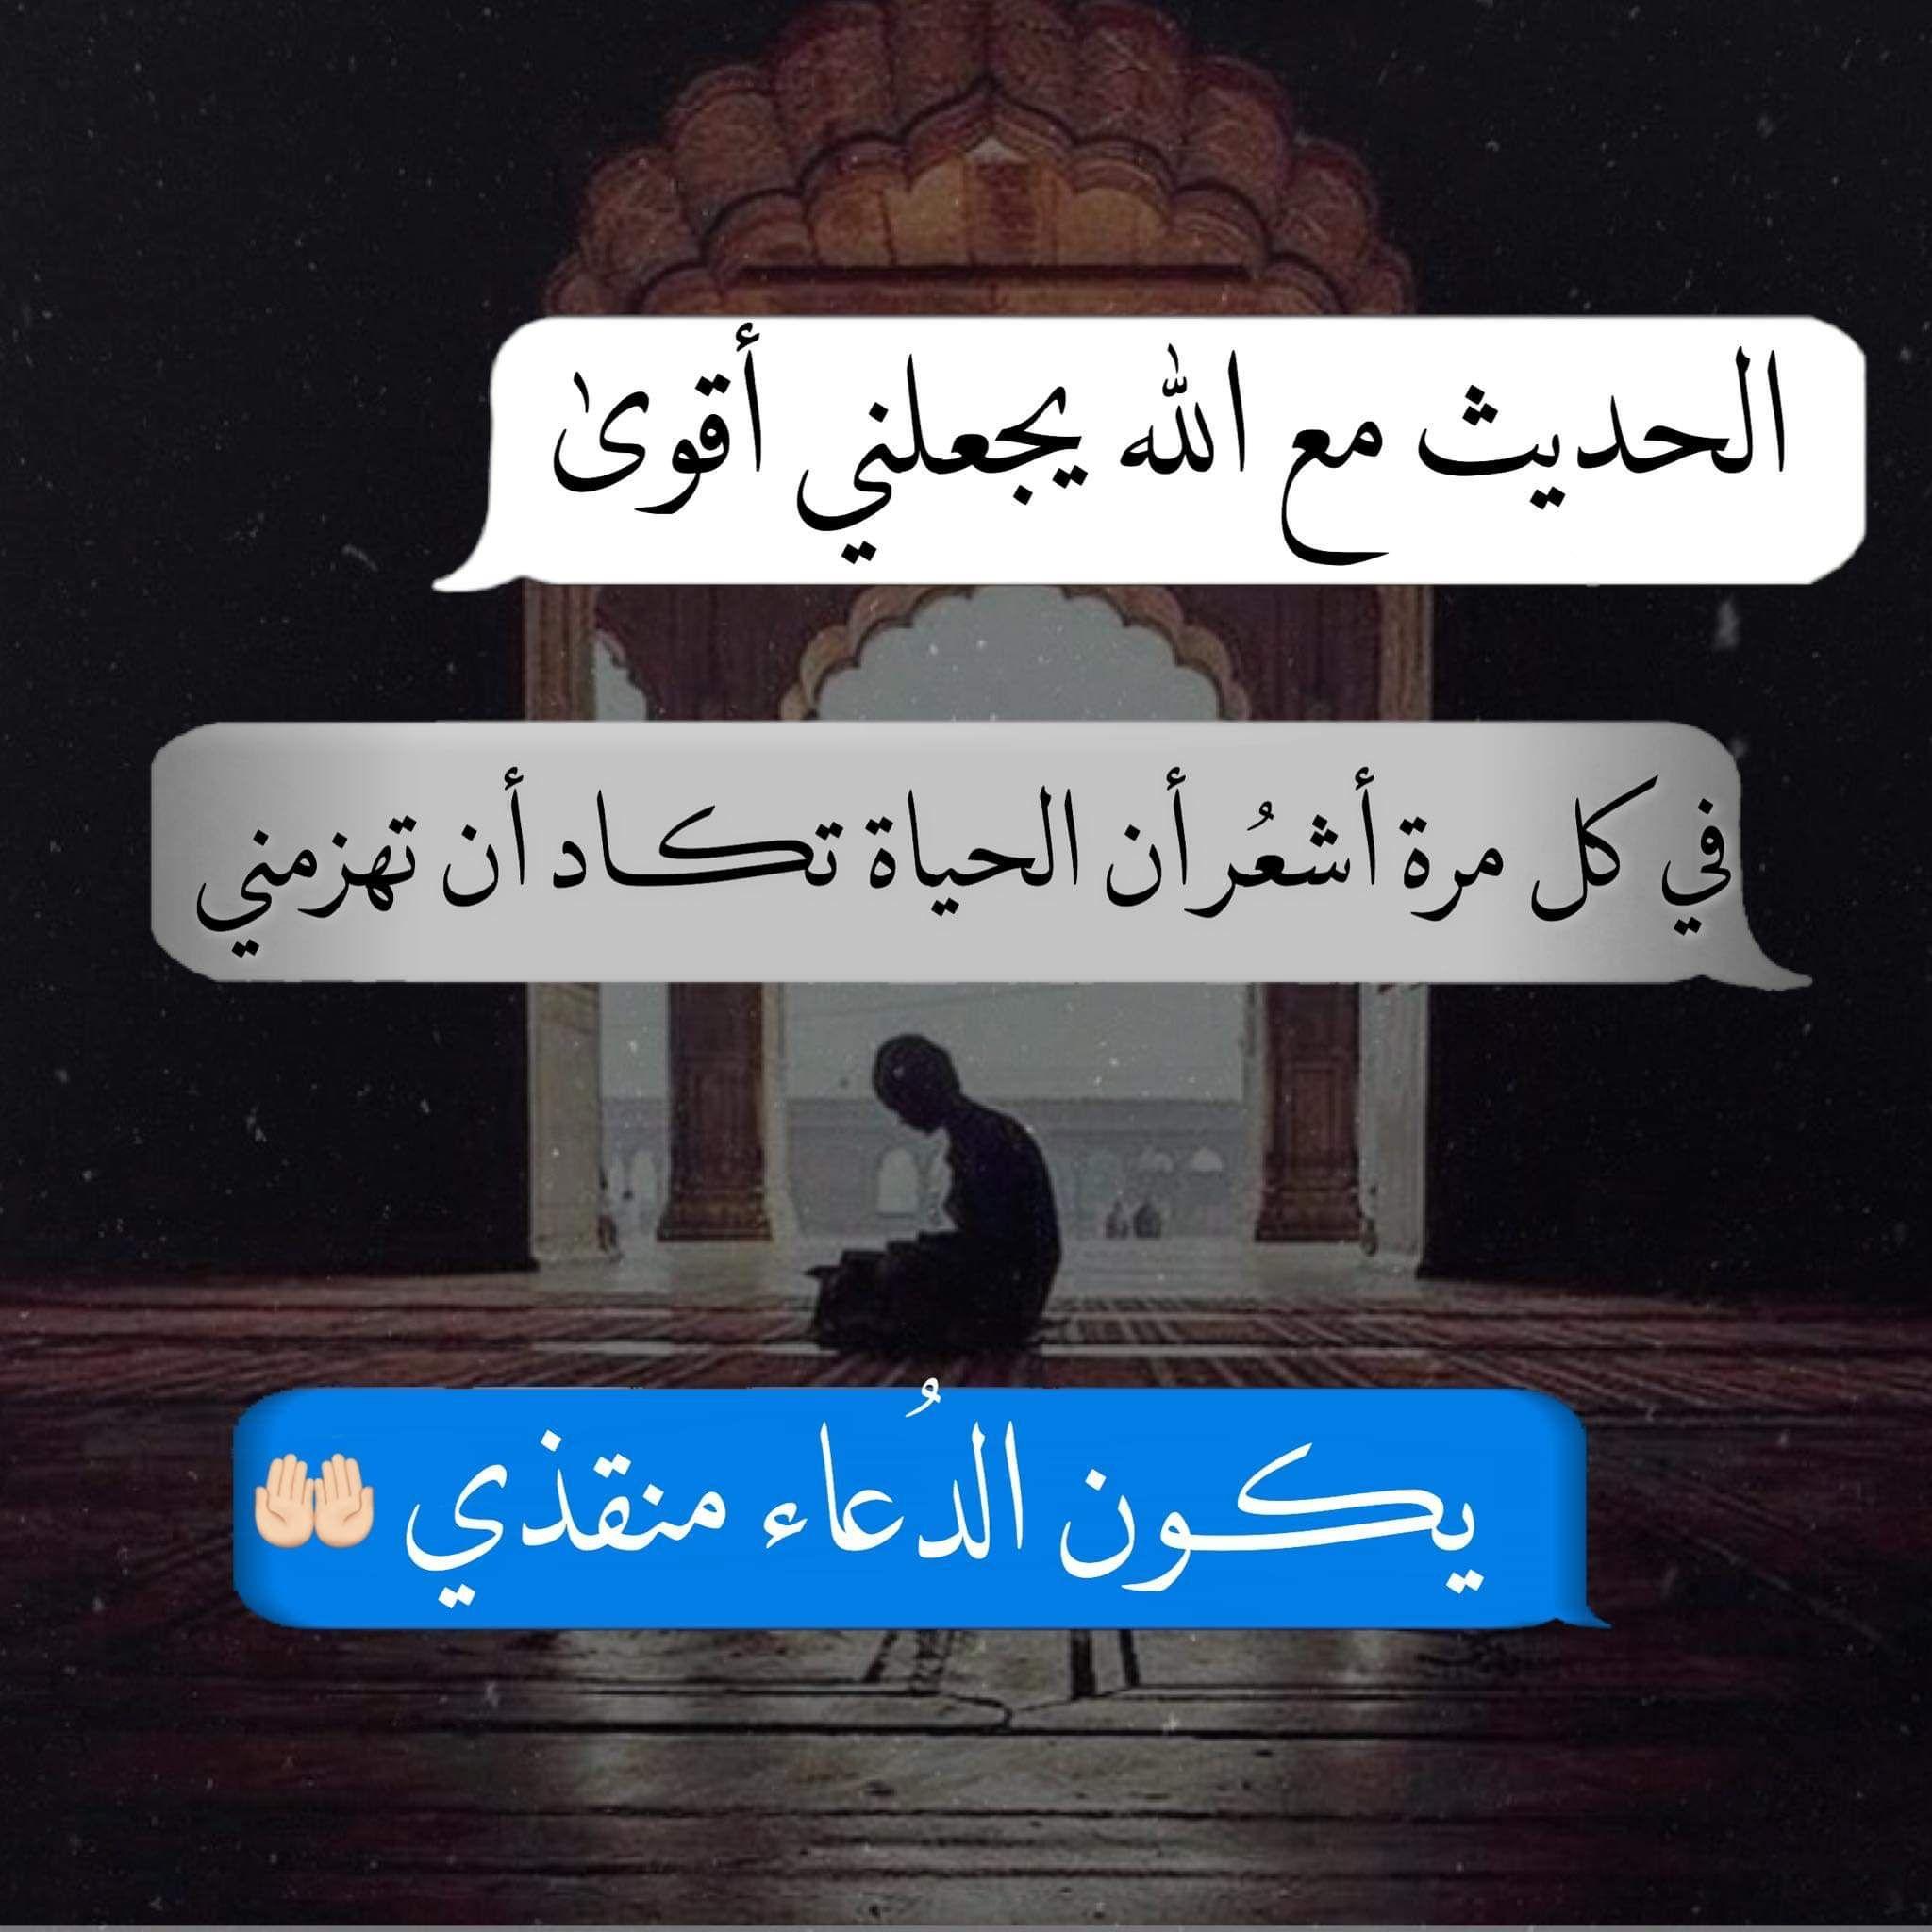 عبارات اسلامية مؤثرة English Quotes Prayers Quotes